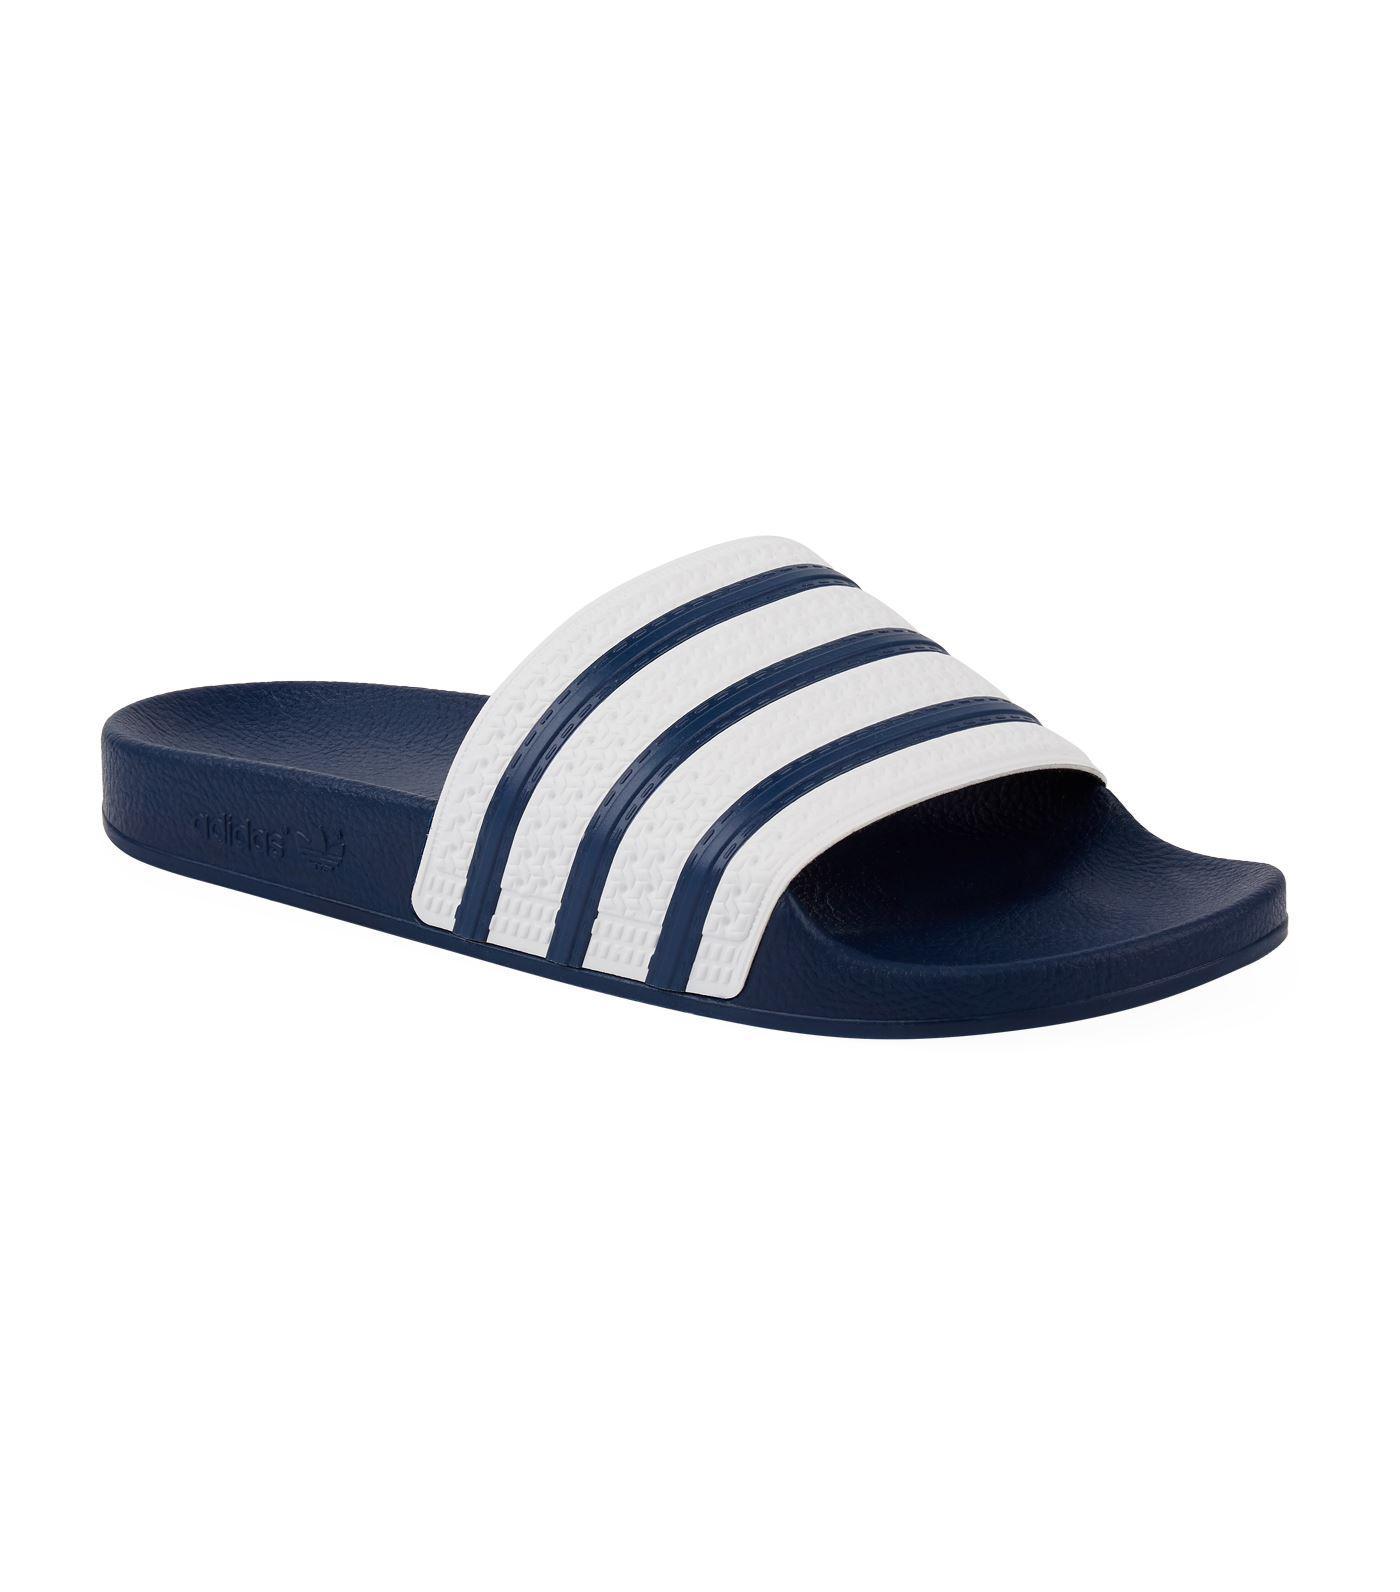 ead85ac20 Lyst - adidas Originals Adilette Slider Flip Flops G16220 in Blue ...